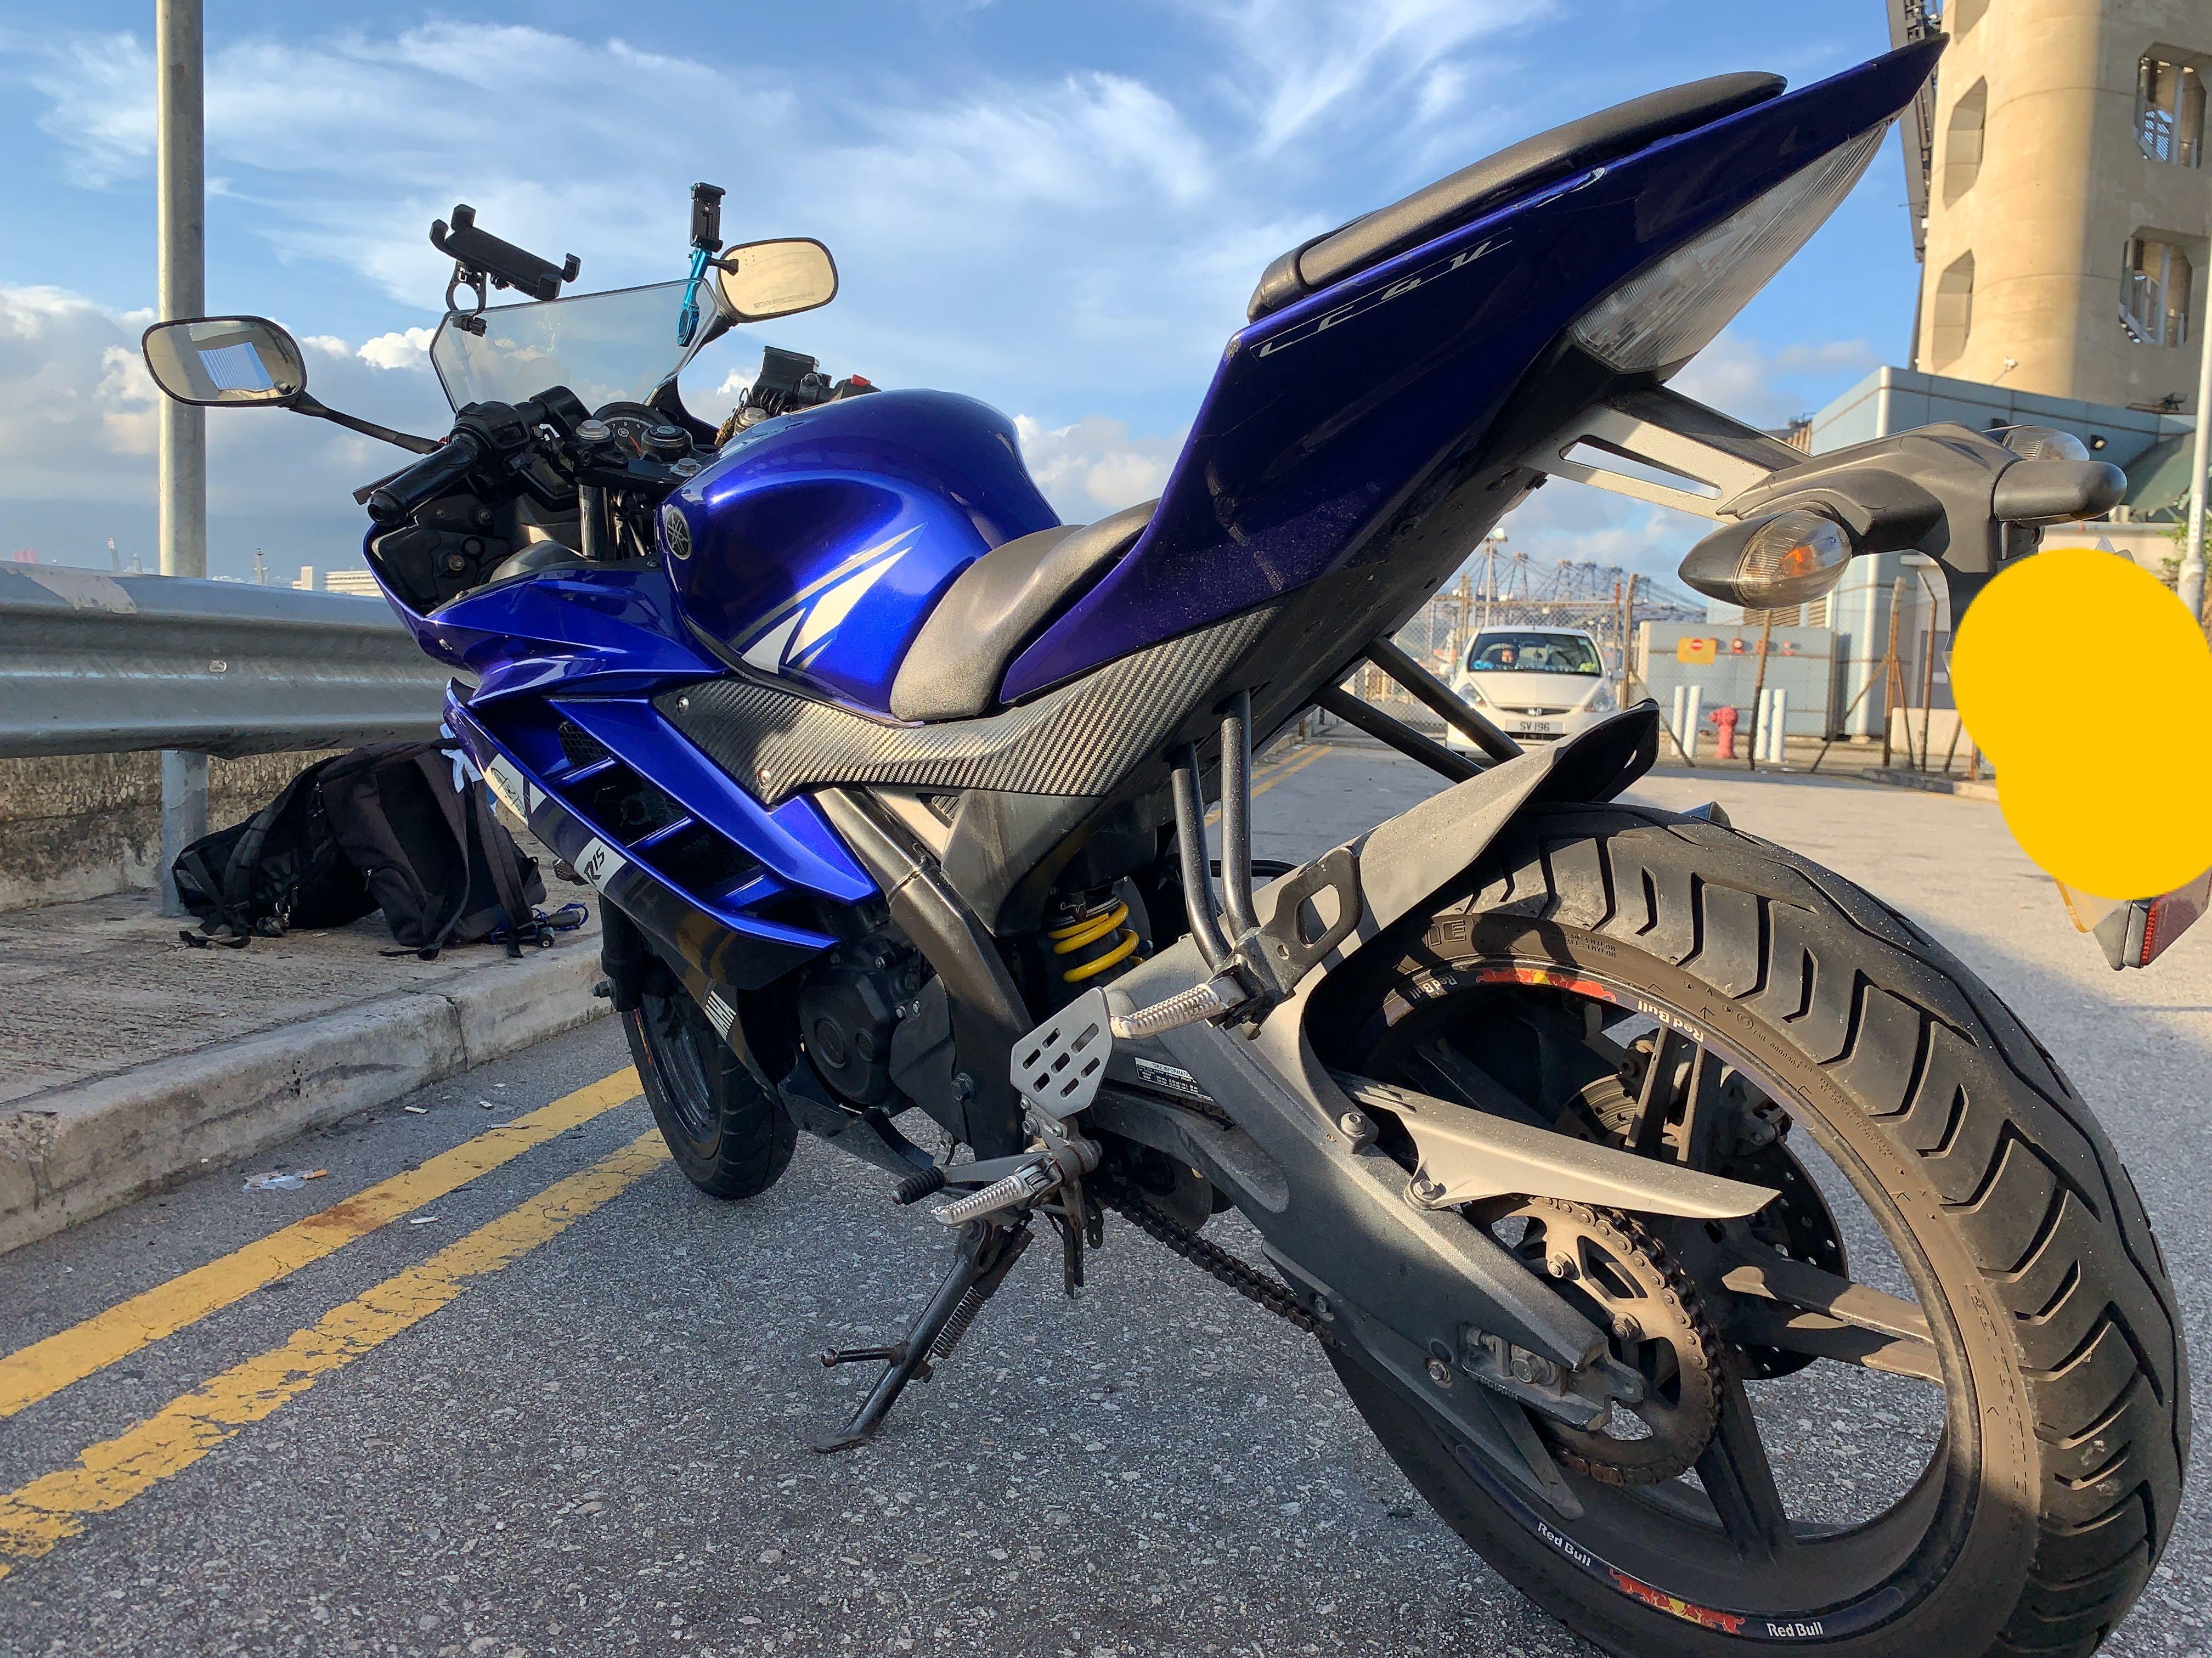 Yamaha R15 V2, 2012, Slip on exhaust (akrapovic), Good Condition